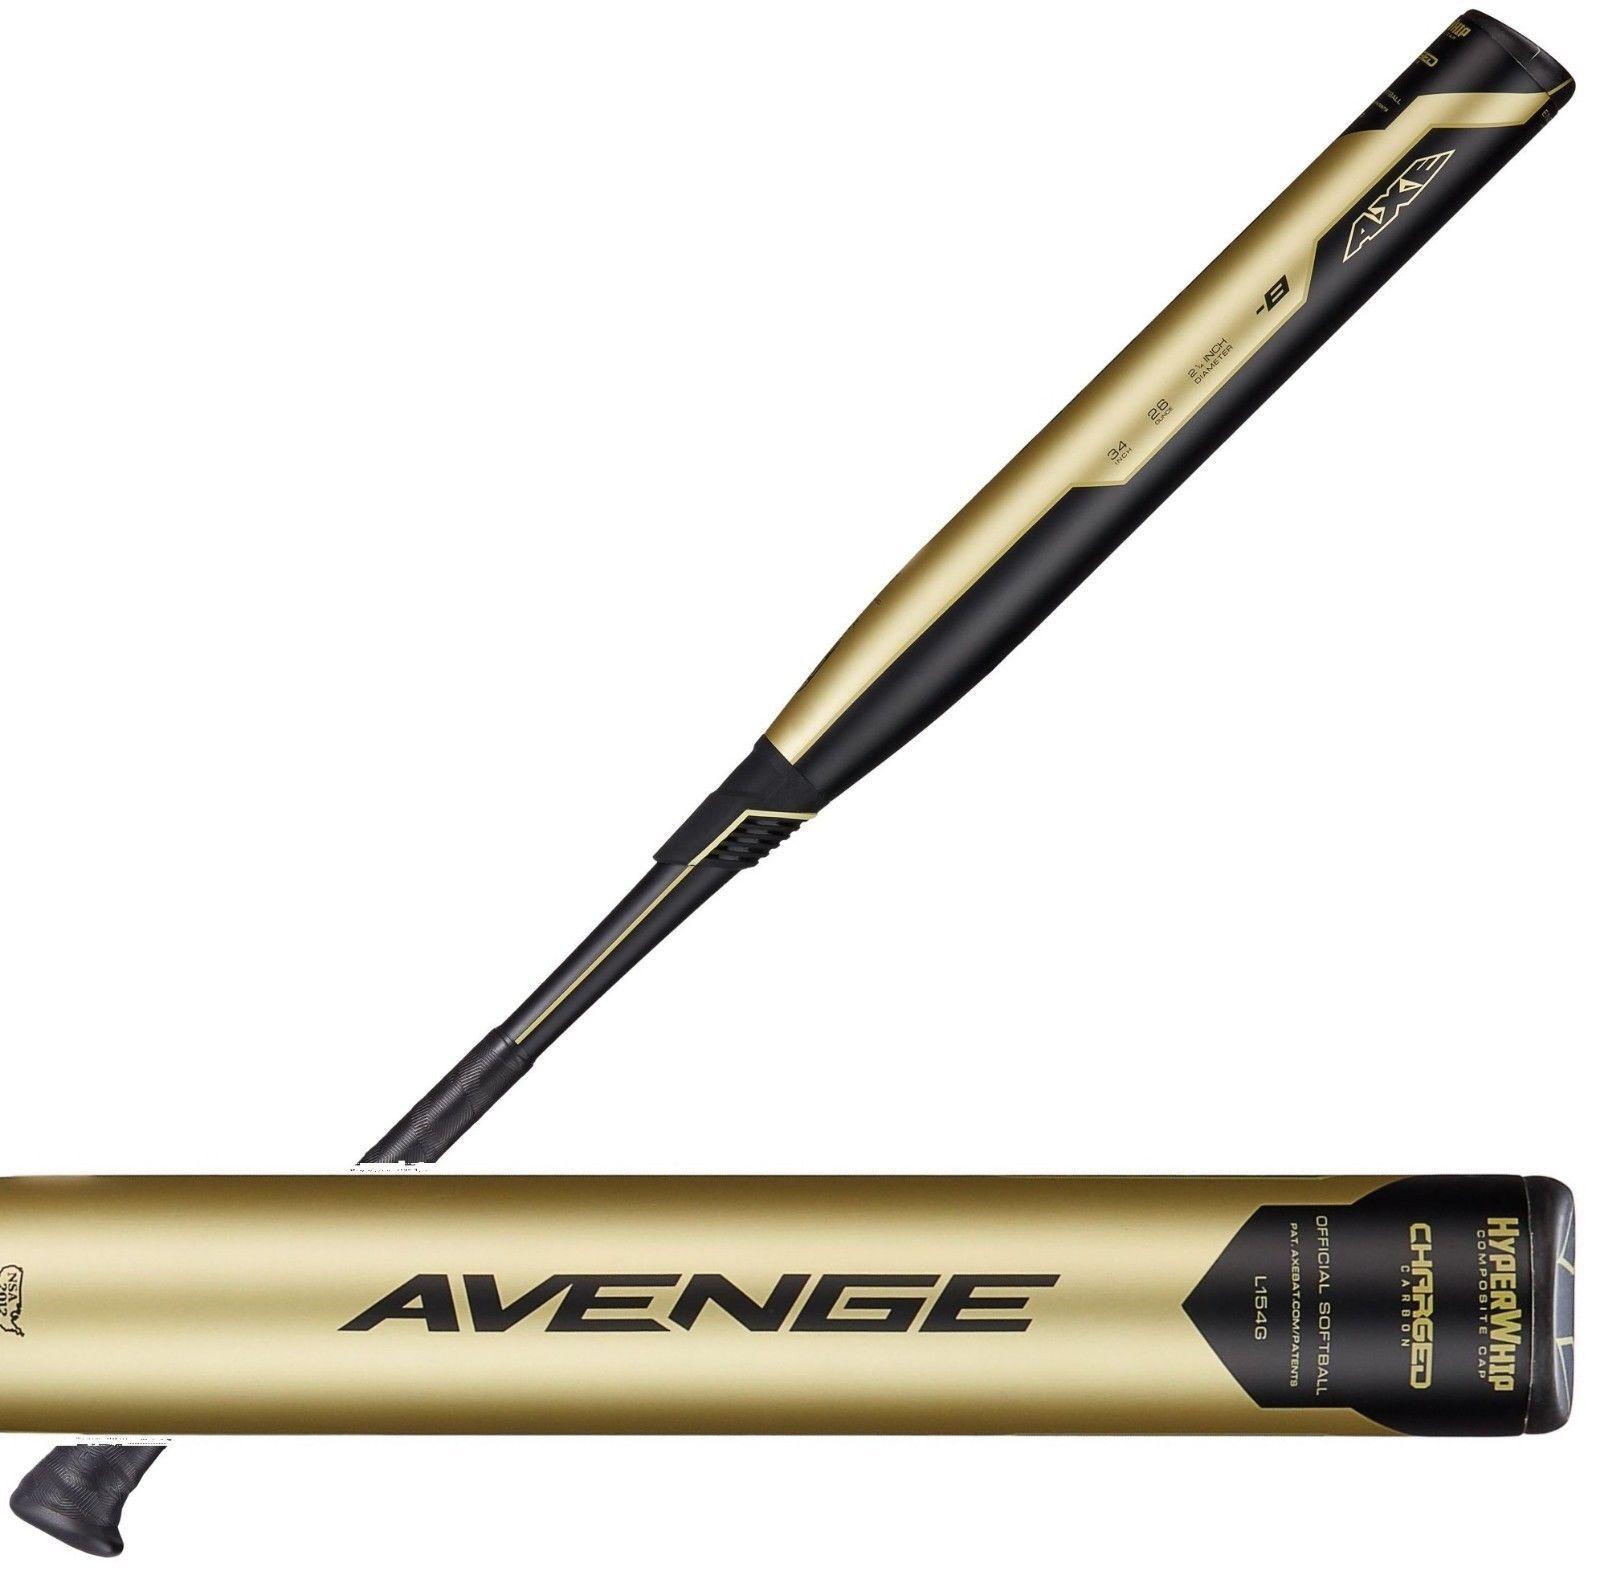 2019 Axe Avenge Balanced 34  27 oz. USSSA Slowpitch Softball Bat L154G